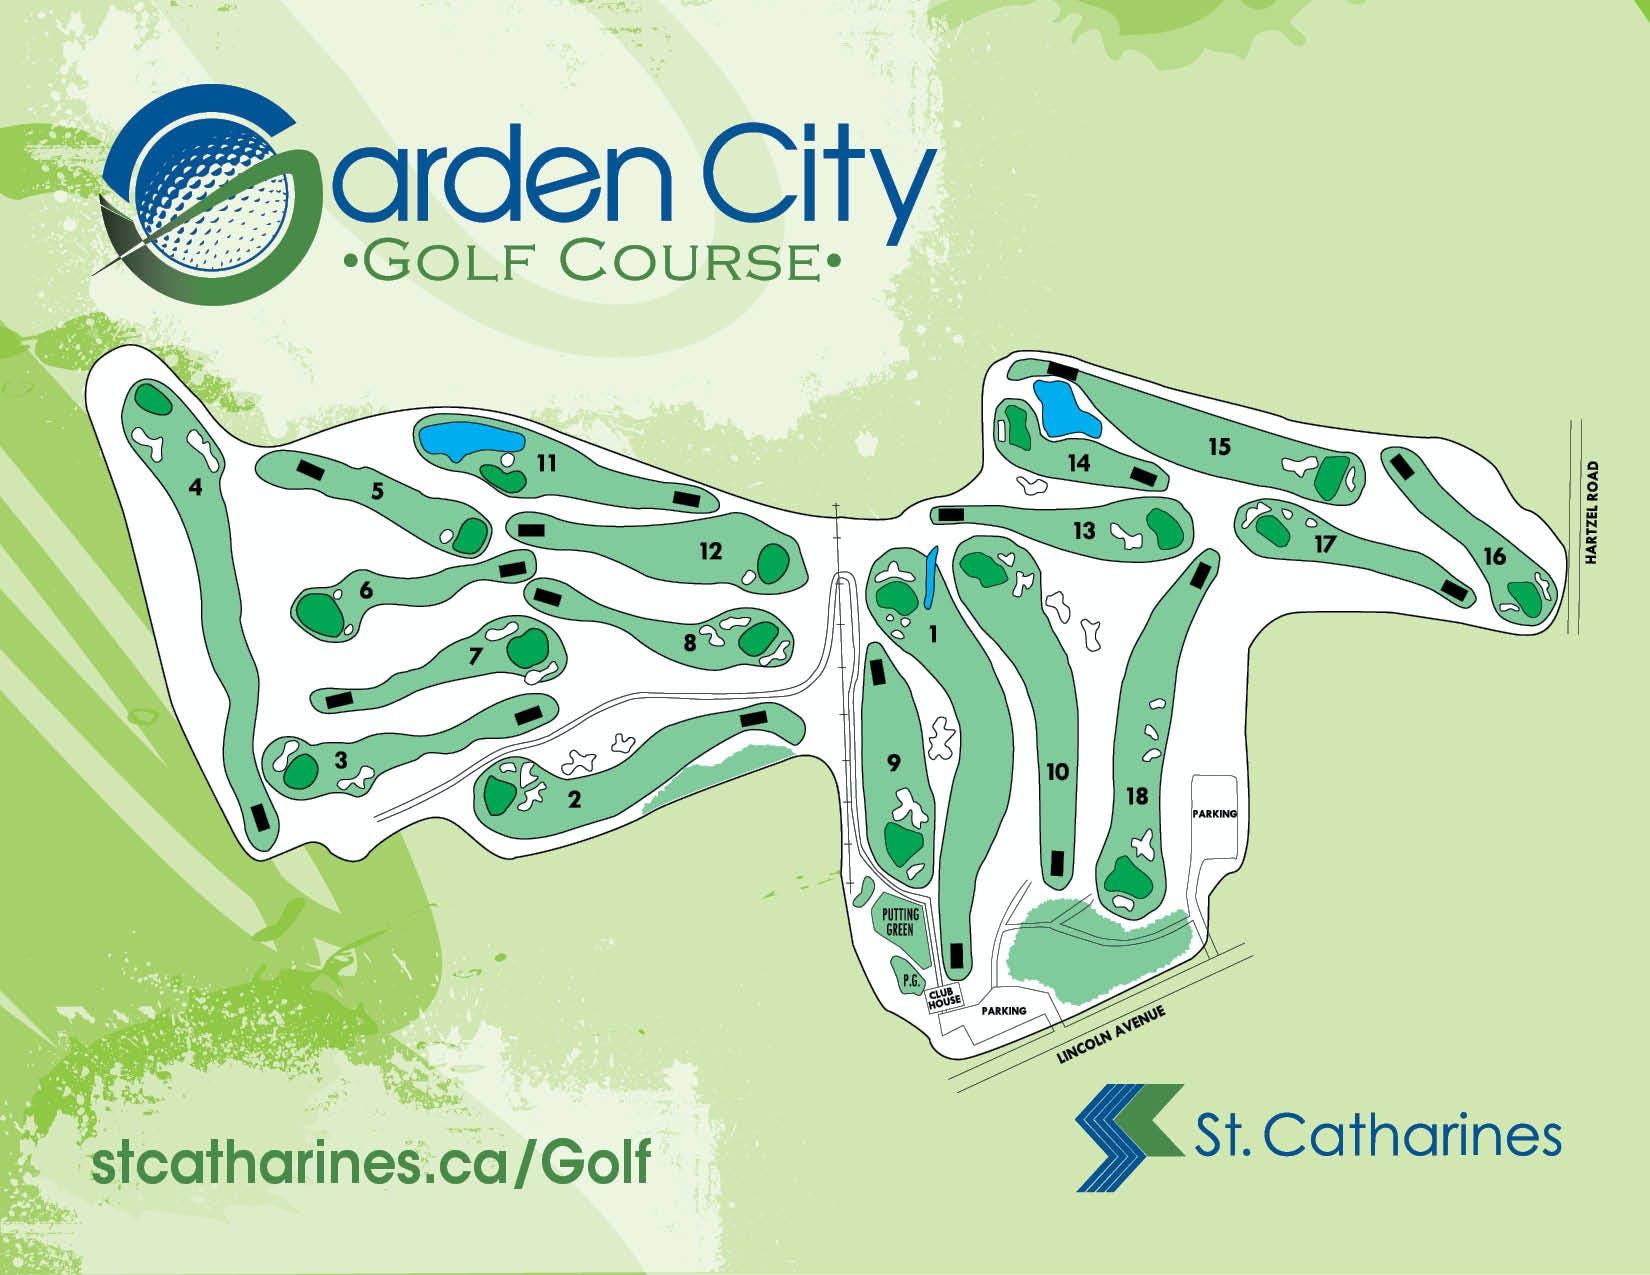 Garden City Golf Course layout